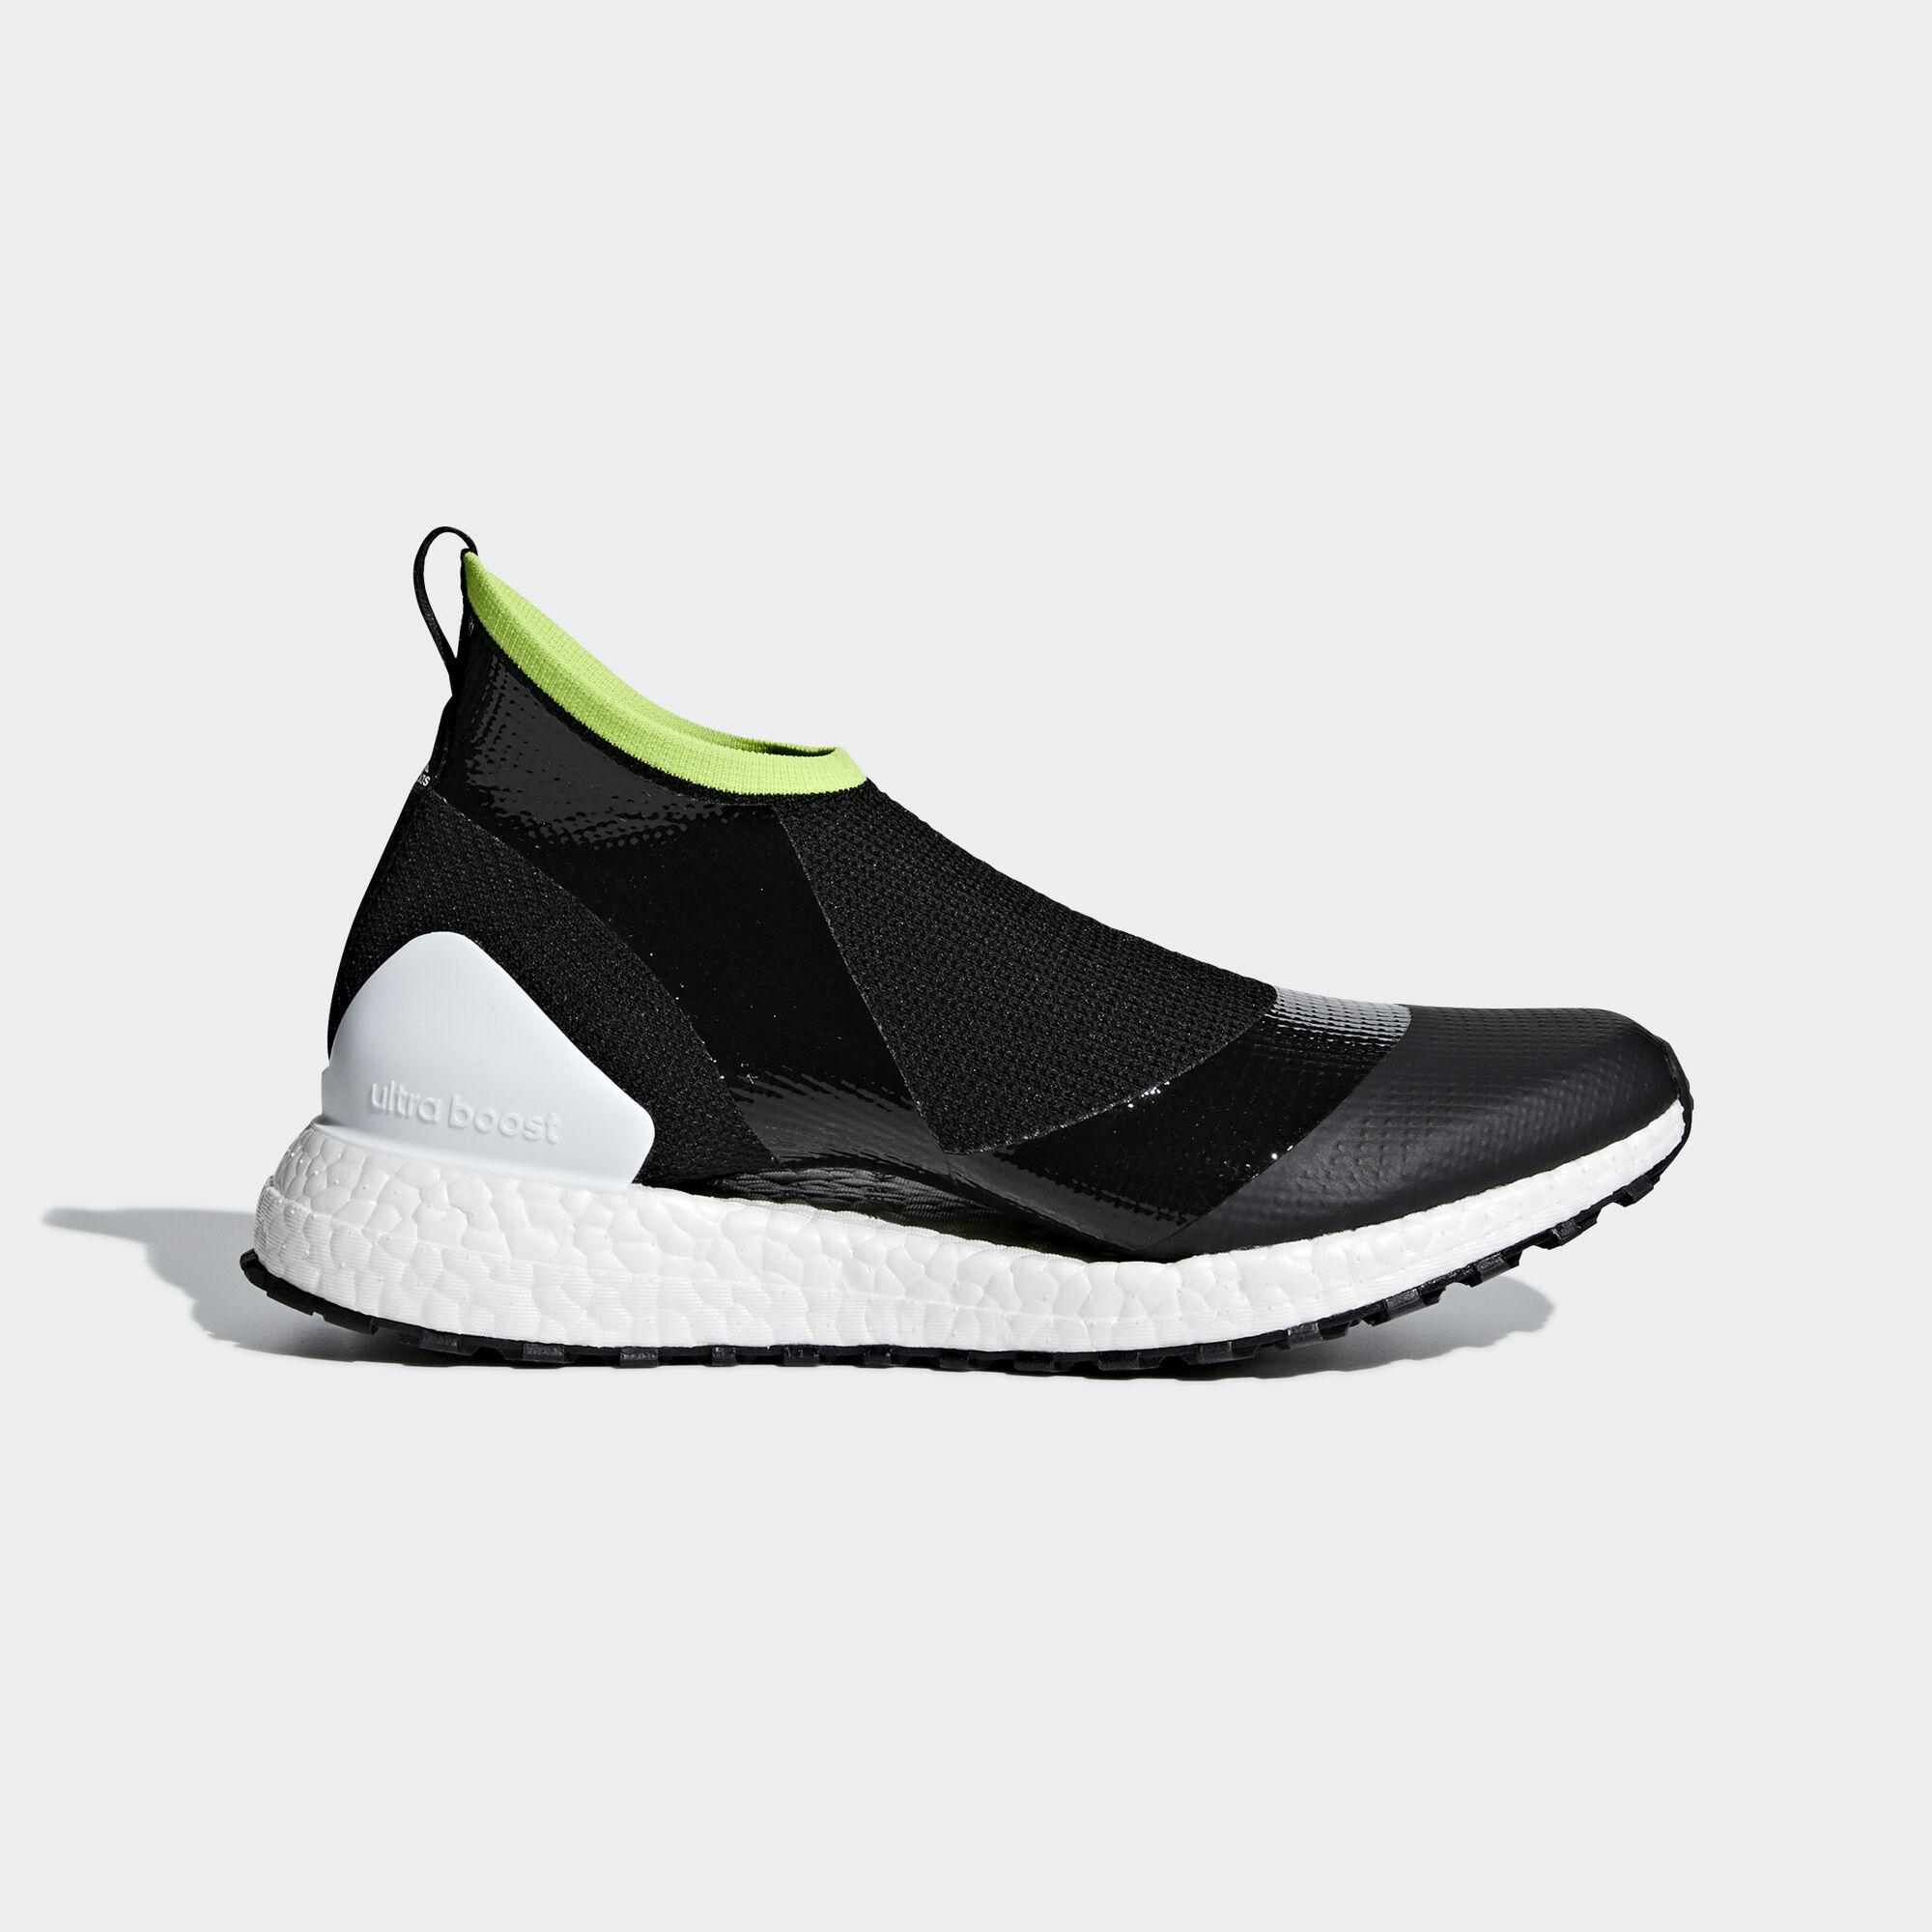 43639ece76f adidas - Ultraboost X All Terrain Core Black   Ftwr White   Solar Slime  AC7567